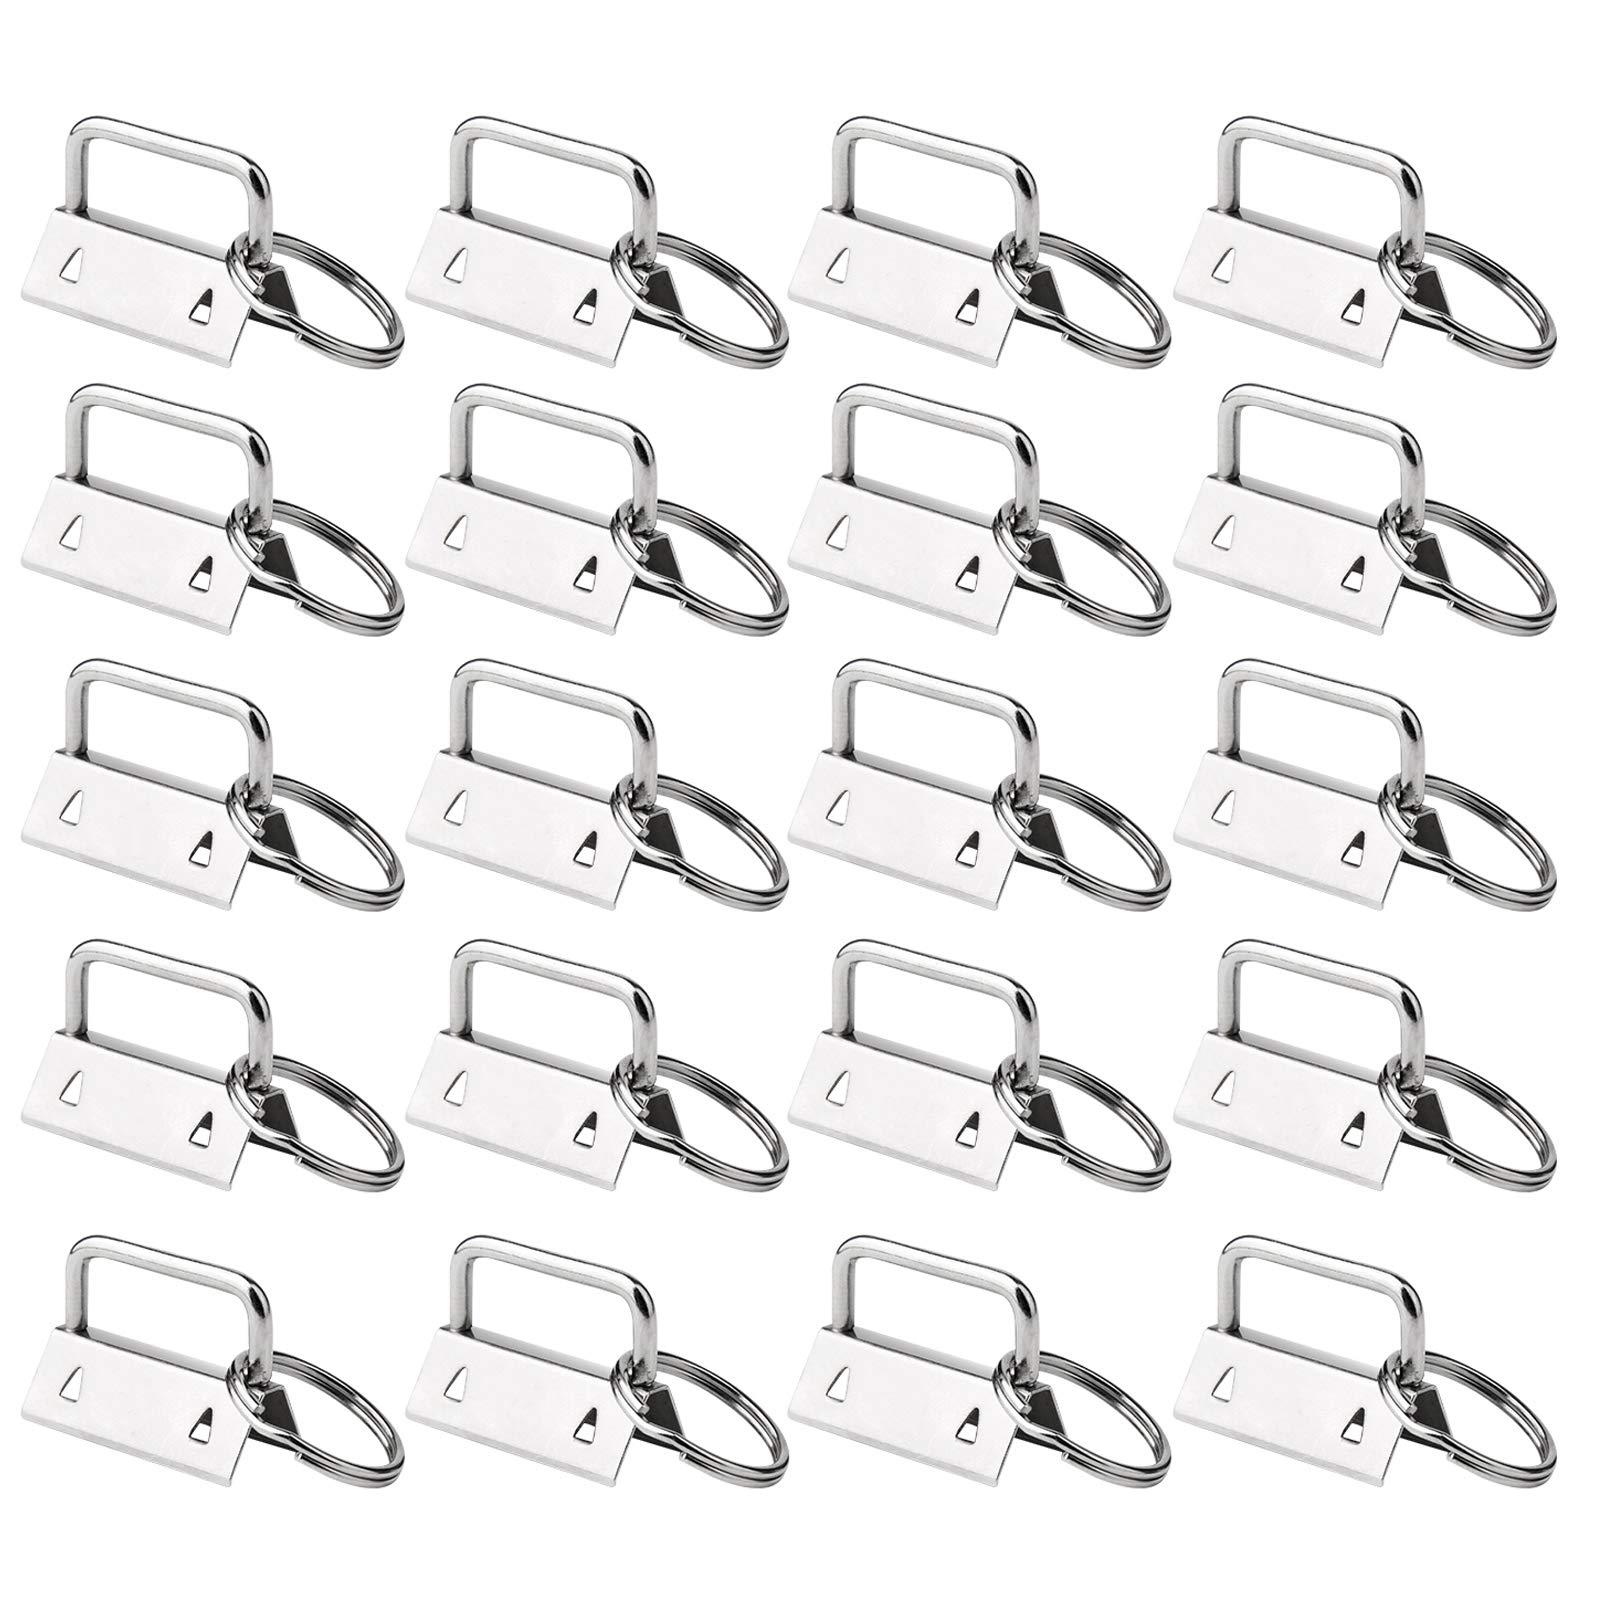 50 Sets Key Fob Hardware Key Fob Keychain Wristlet with Split Ring 1.25 Inch by HRLORKC